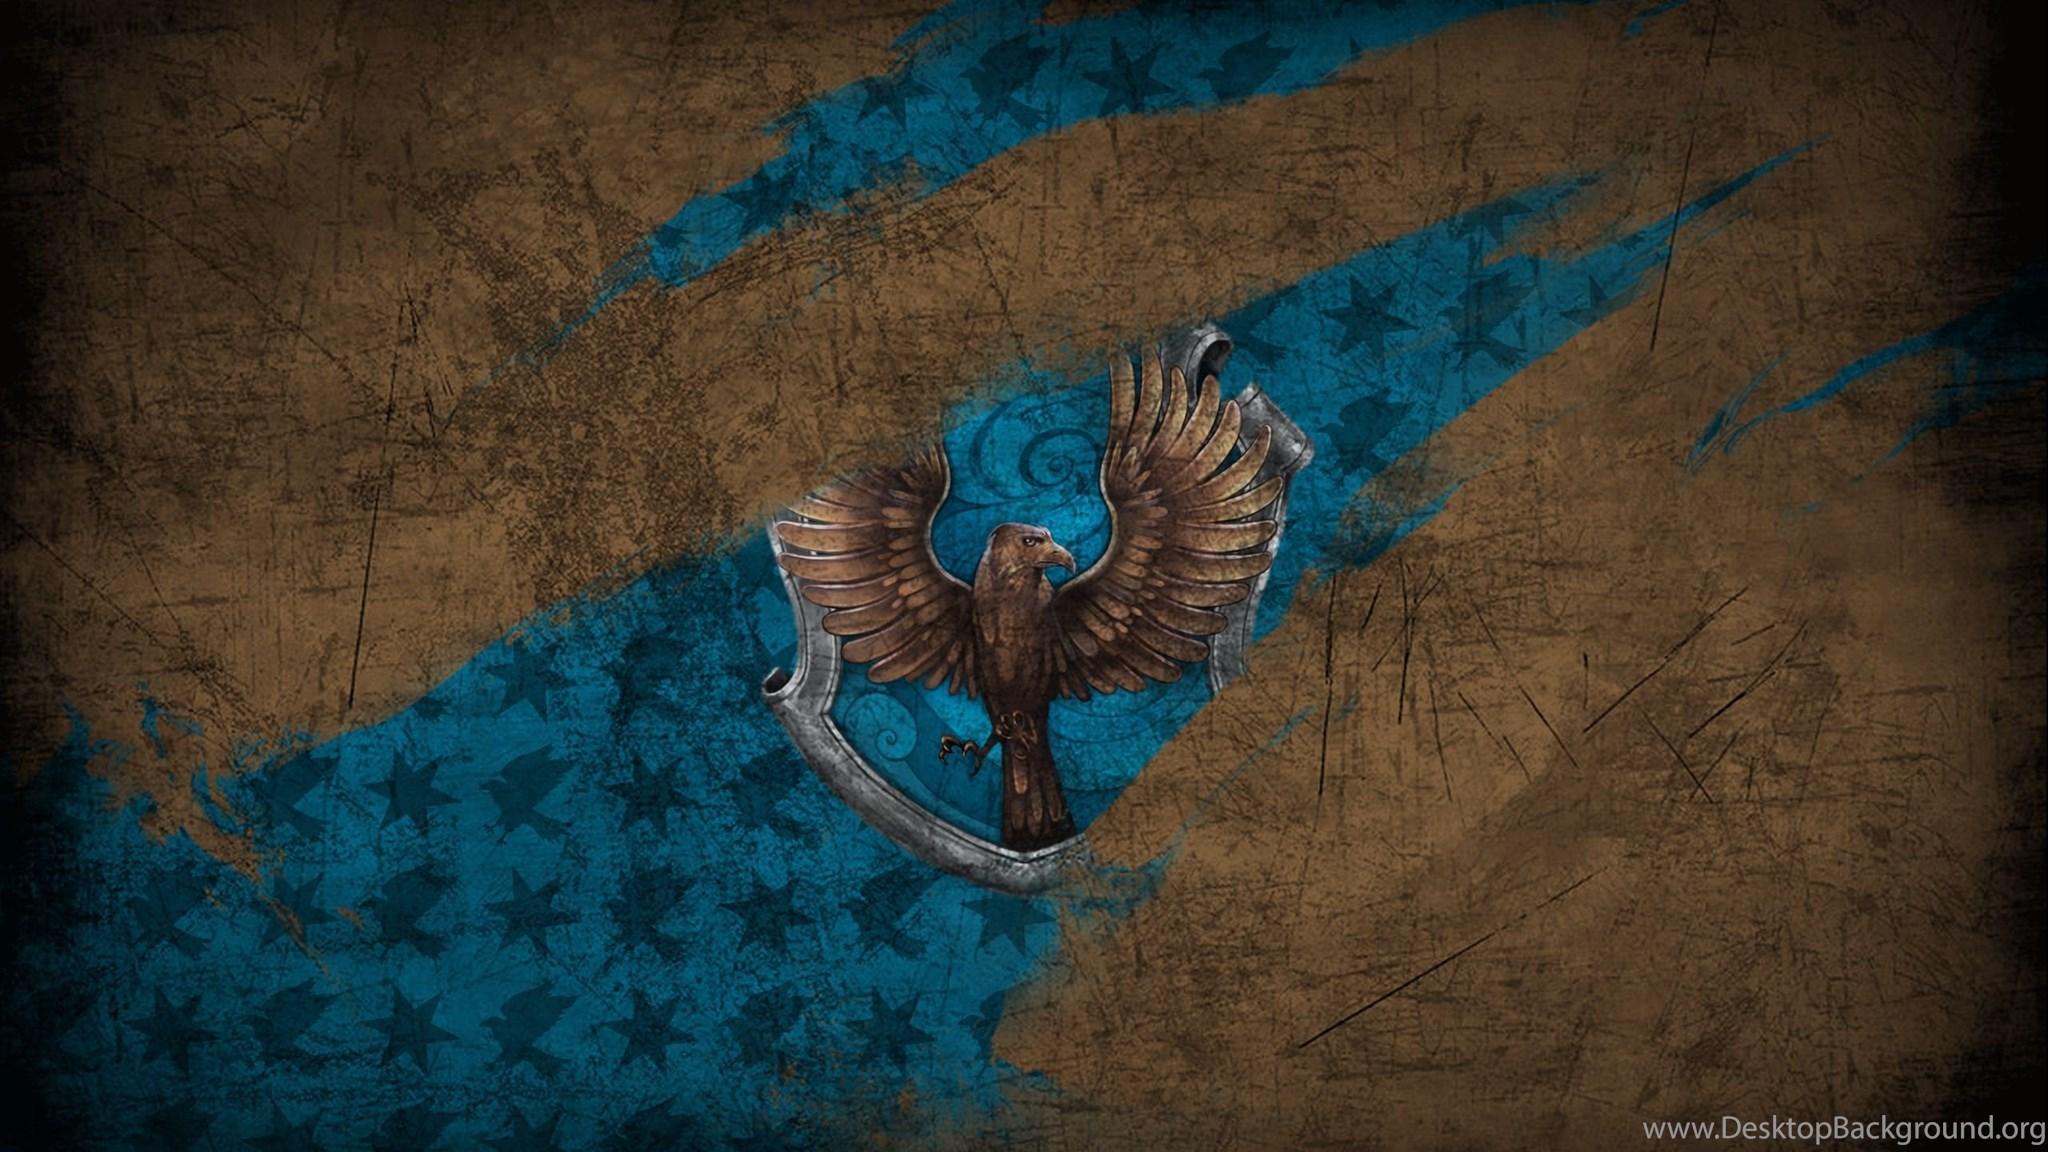 Beautiful Wallpaper Harry Potter Dual Screen - 335552_ravenclaw-logo-harry-potter-desktop-wallpapers-23926_2560x1440_h  Pictures_648244.jpg